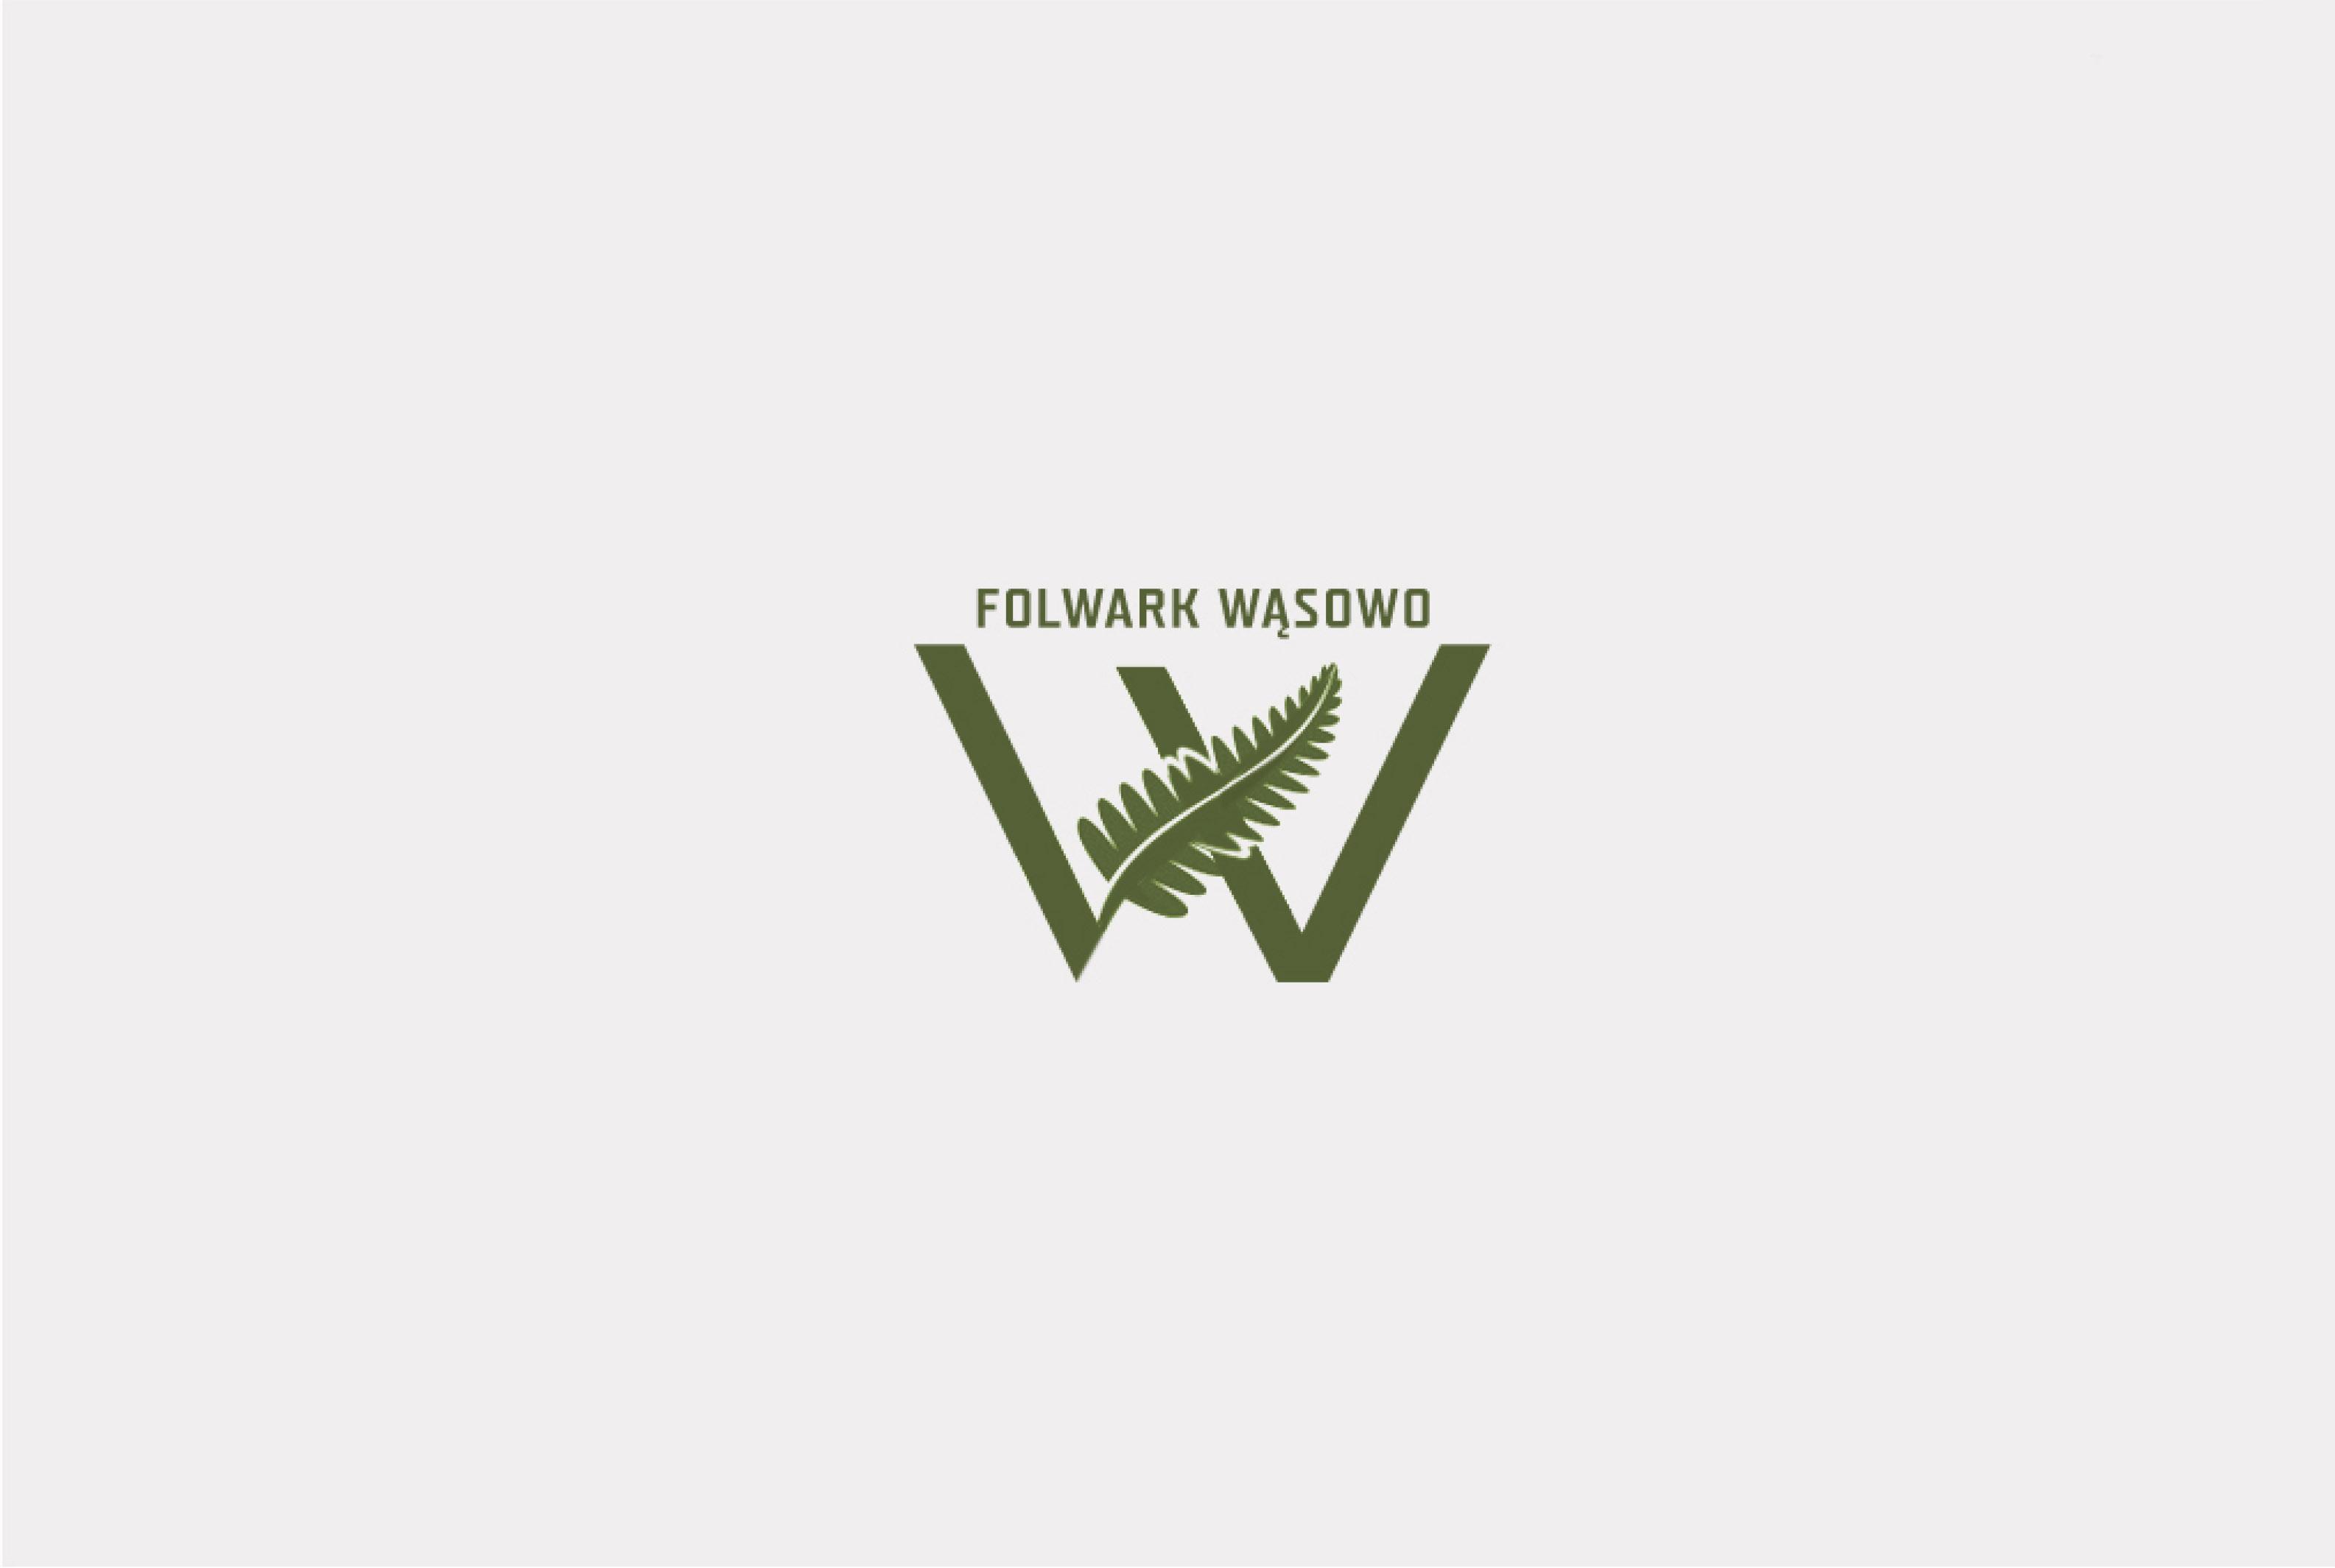 SIMPLICITY_FOLWARK WASOWO_4-1